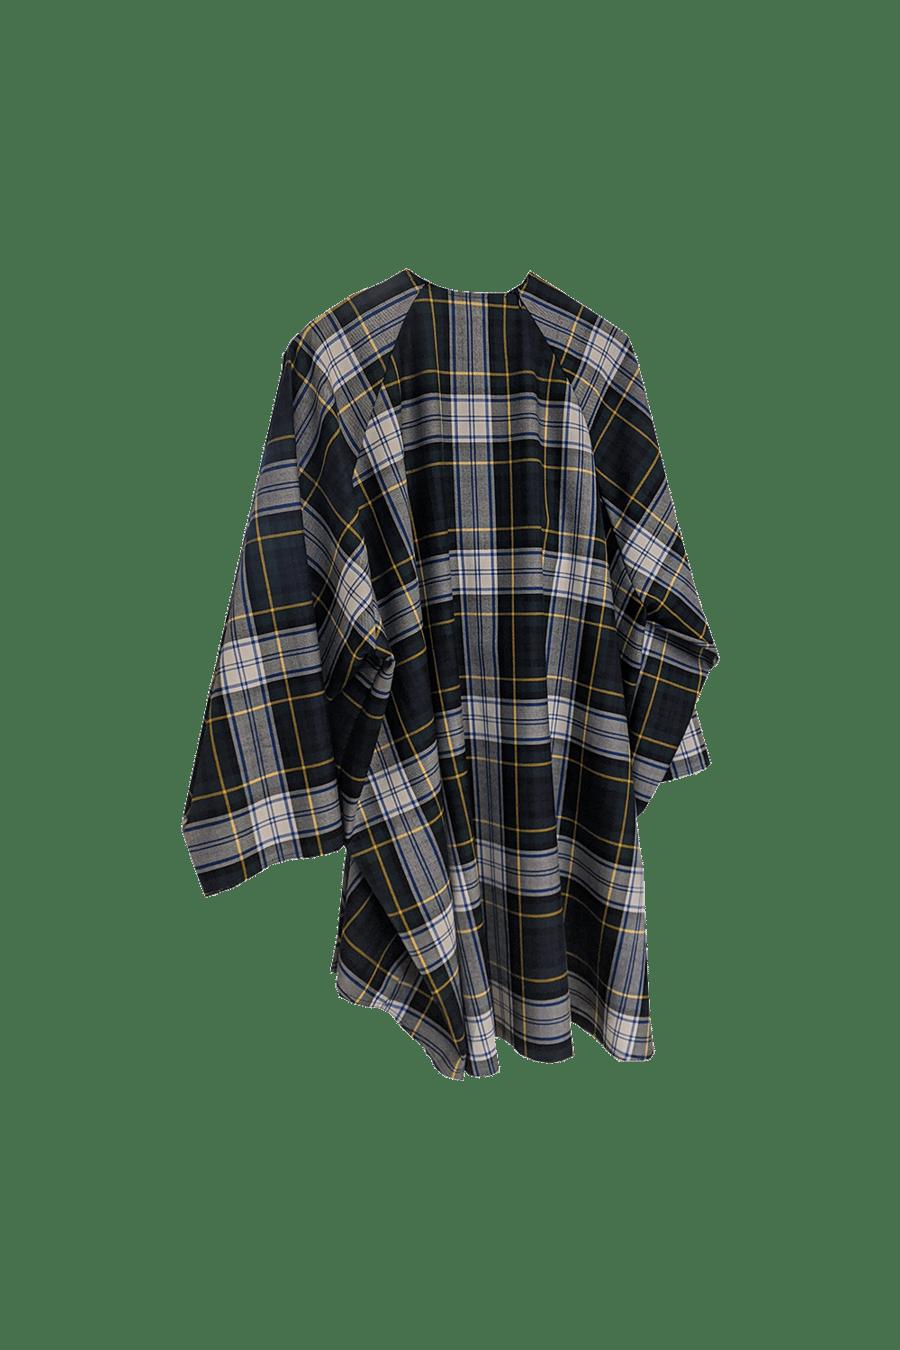 Image of Dress 1 - Wool - Green/yellow check